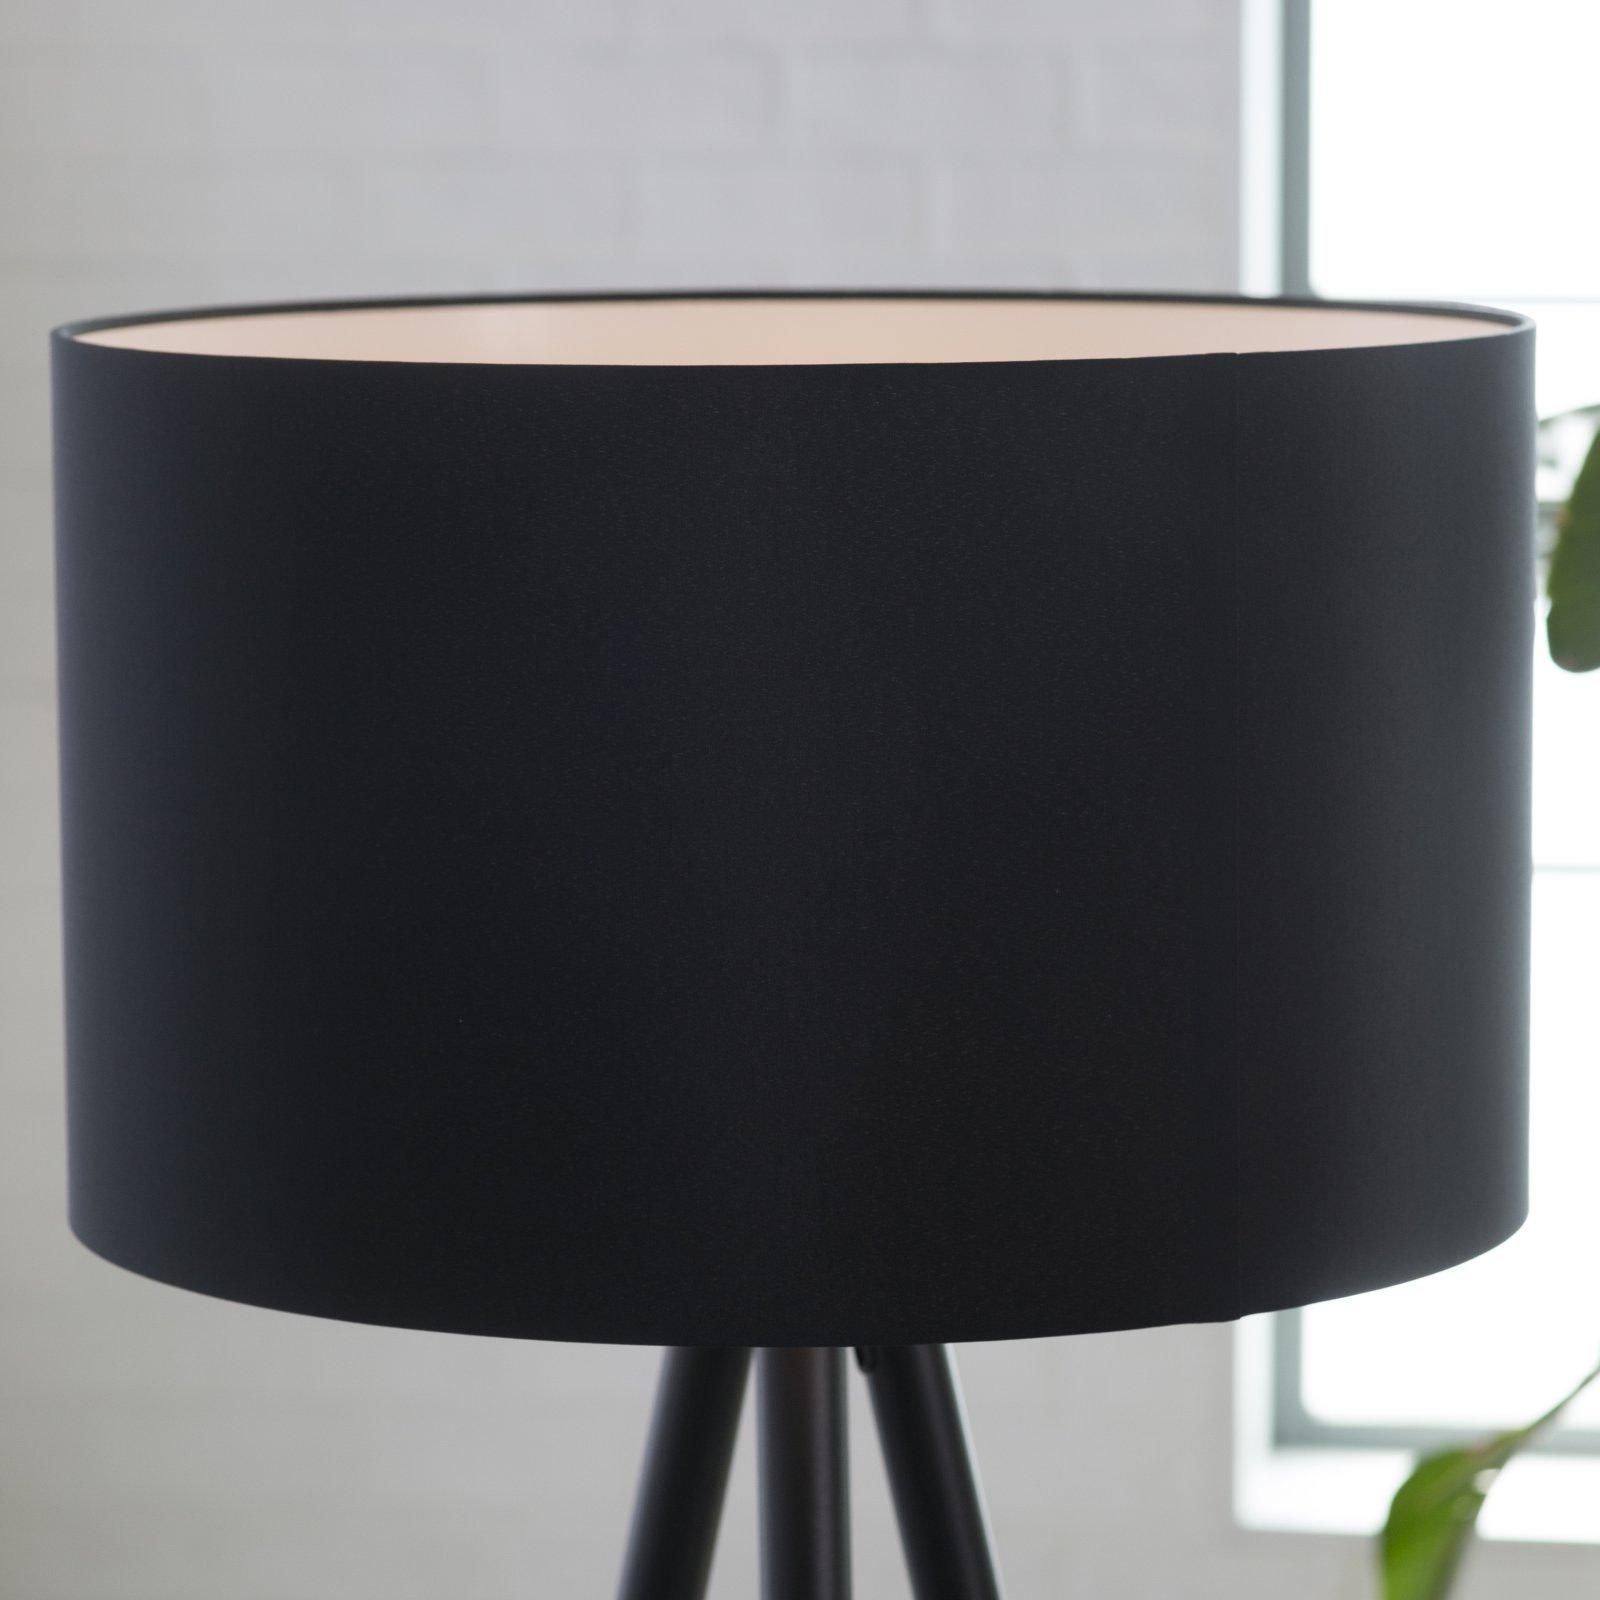 Adesso 6285 01 Louise Floor Lamp 60 25 In 150 W Incandescent Equiv Cfl Black Painted Metal W Wood Tips 1 Floor Lamp